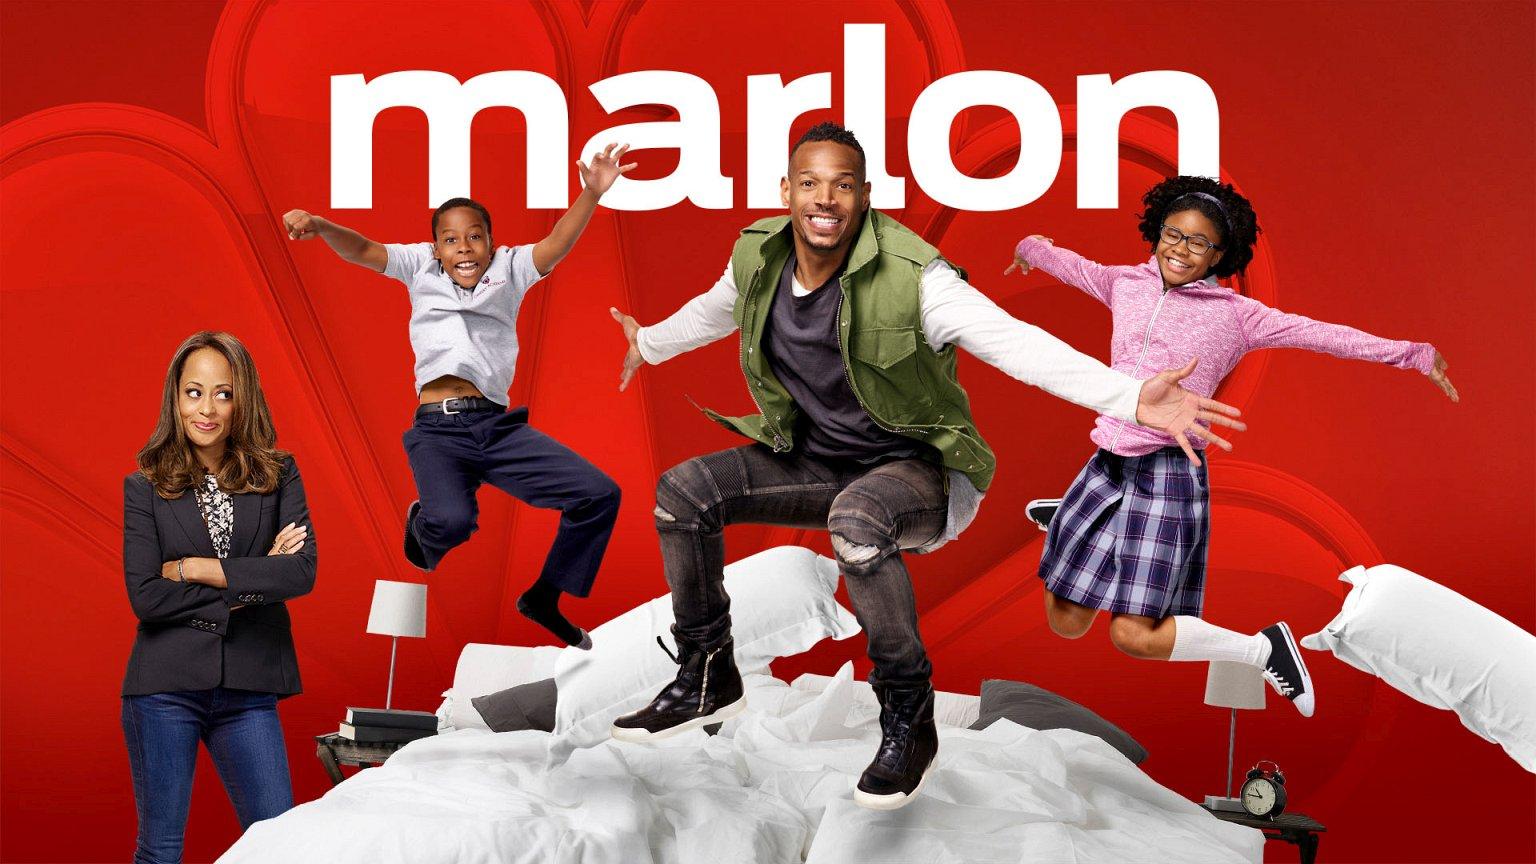 Marlon season 2 episode 3 watch online